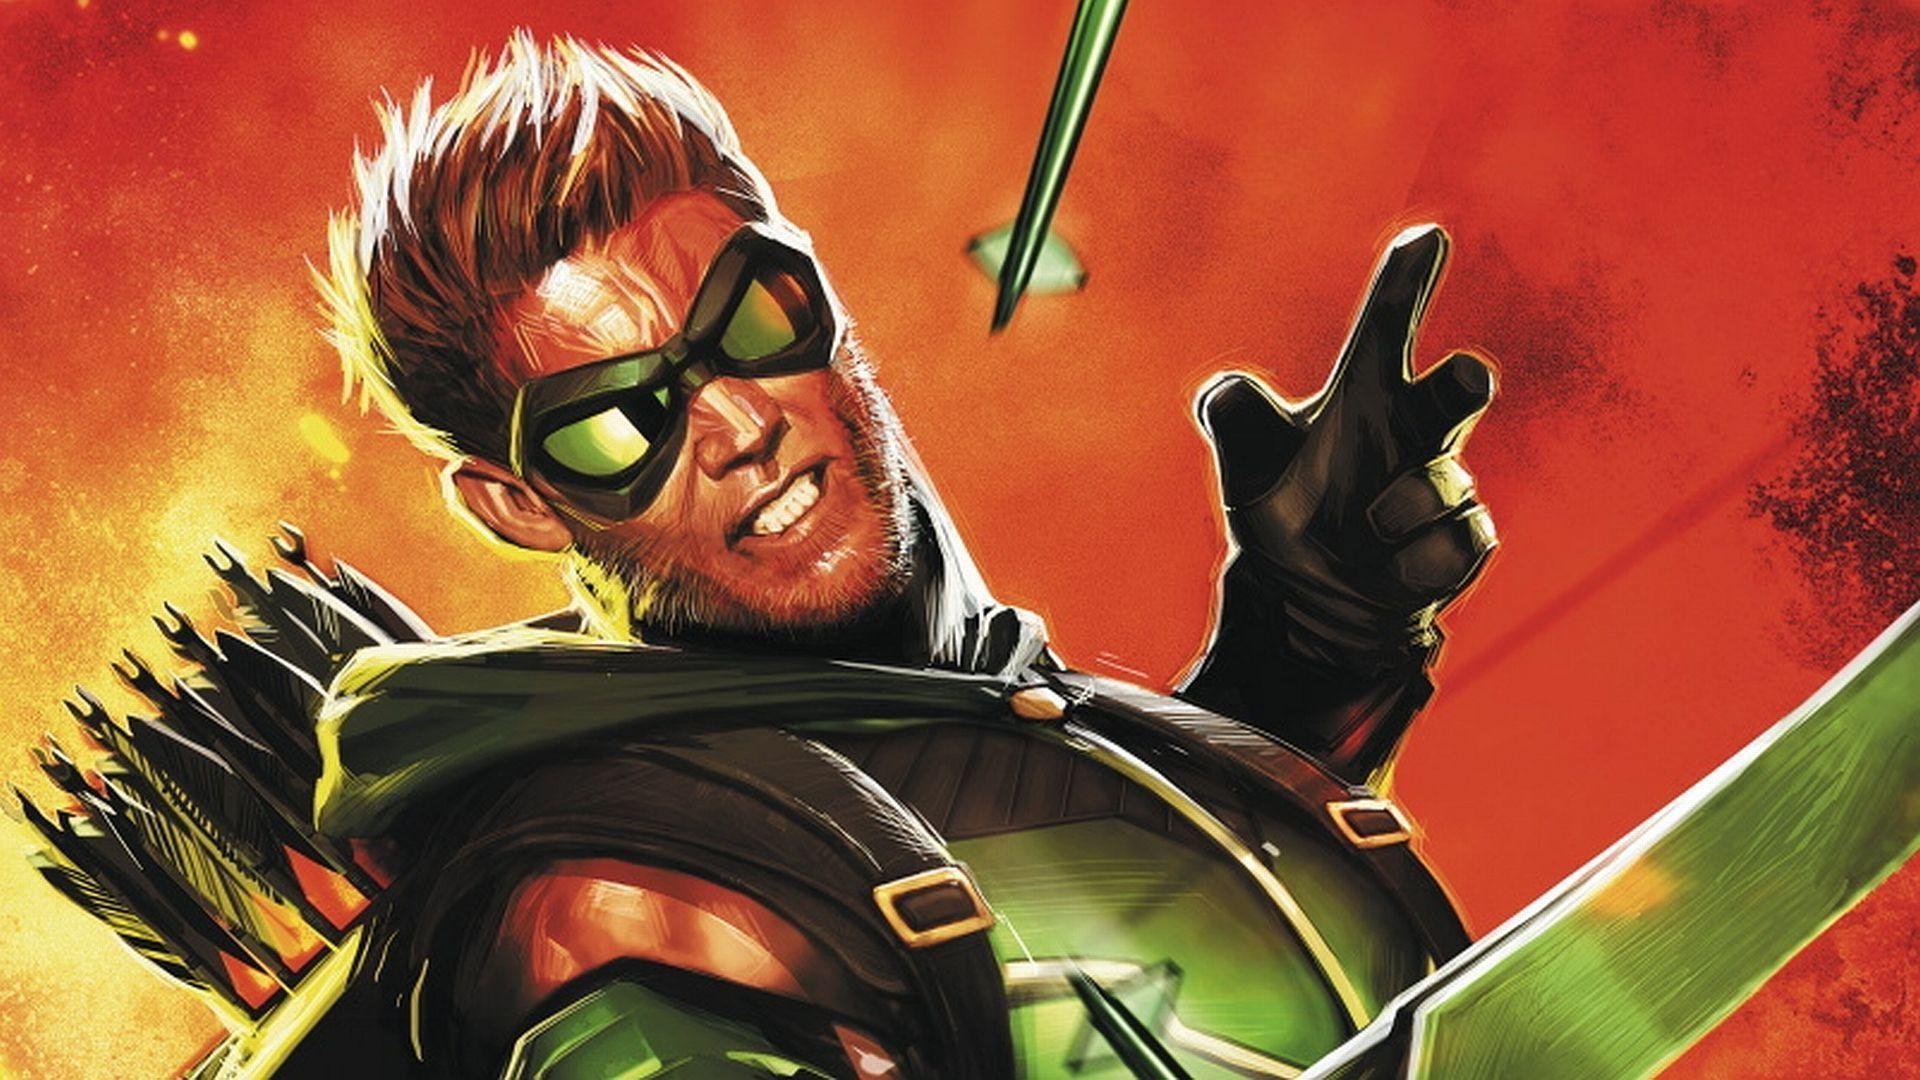 KY:83 – Green Arrow Wallpaper, Fantastic Green Arrow HD Wallpapers .